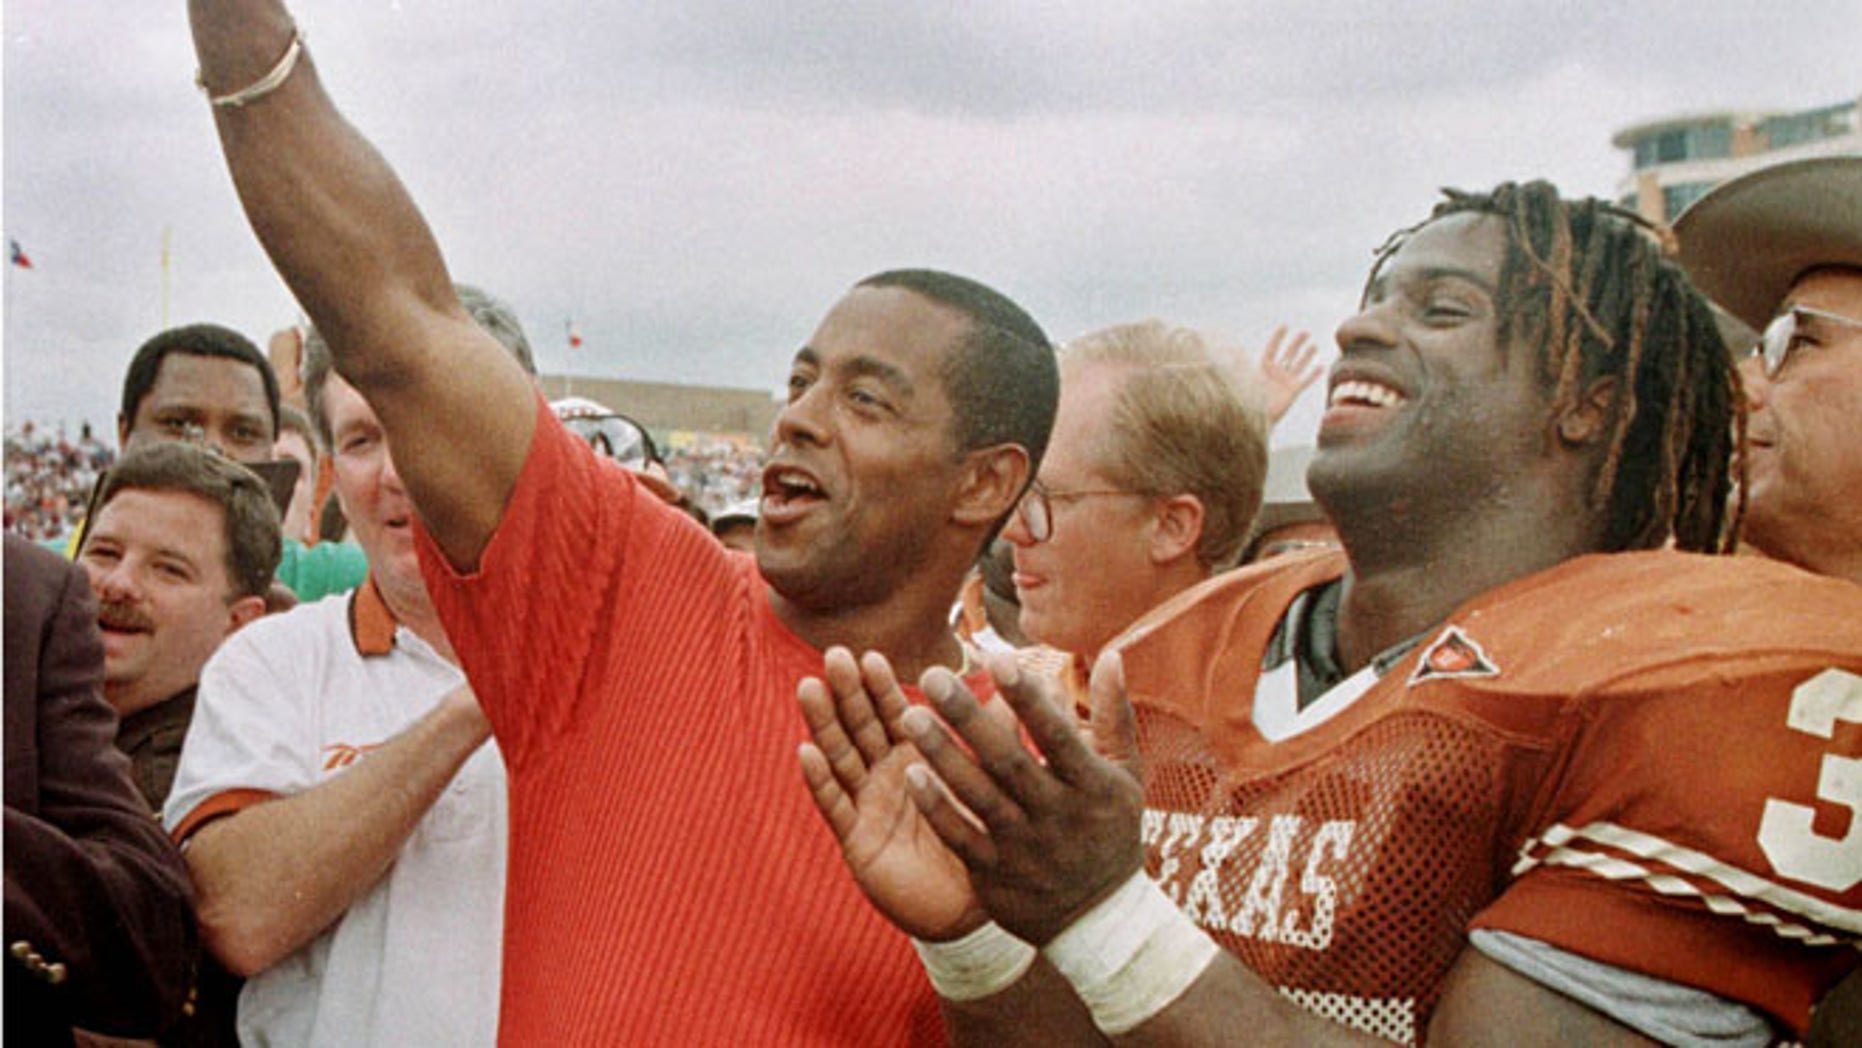 FILE: University of Texas Longhorns Ricky Williams, right, laughs as former Dallas Cowboys star Tony Dorsett signals 'Hook 'em horn' after Williams surpassed Dorsett's NCAA rushing record.